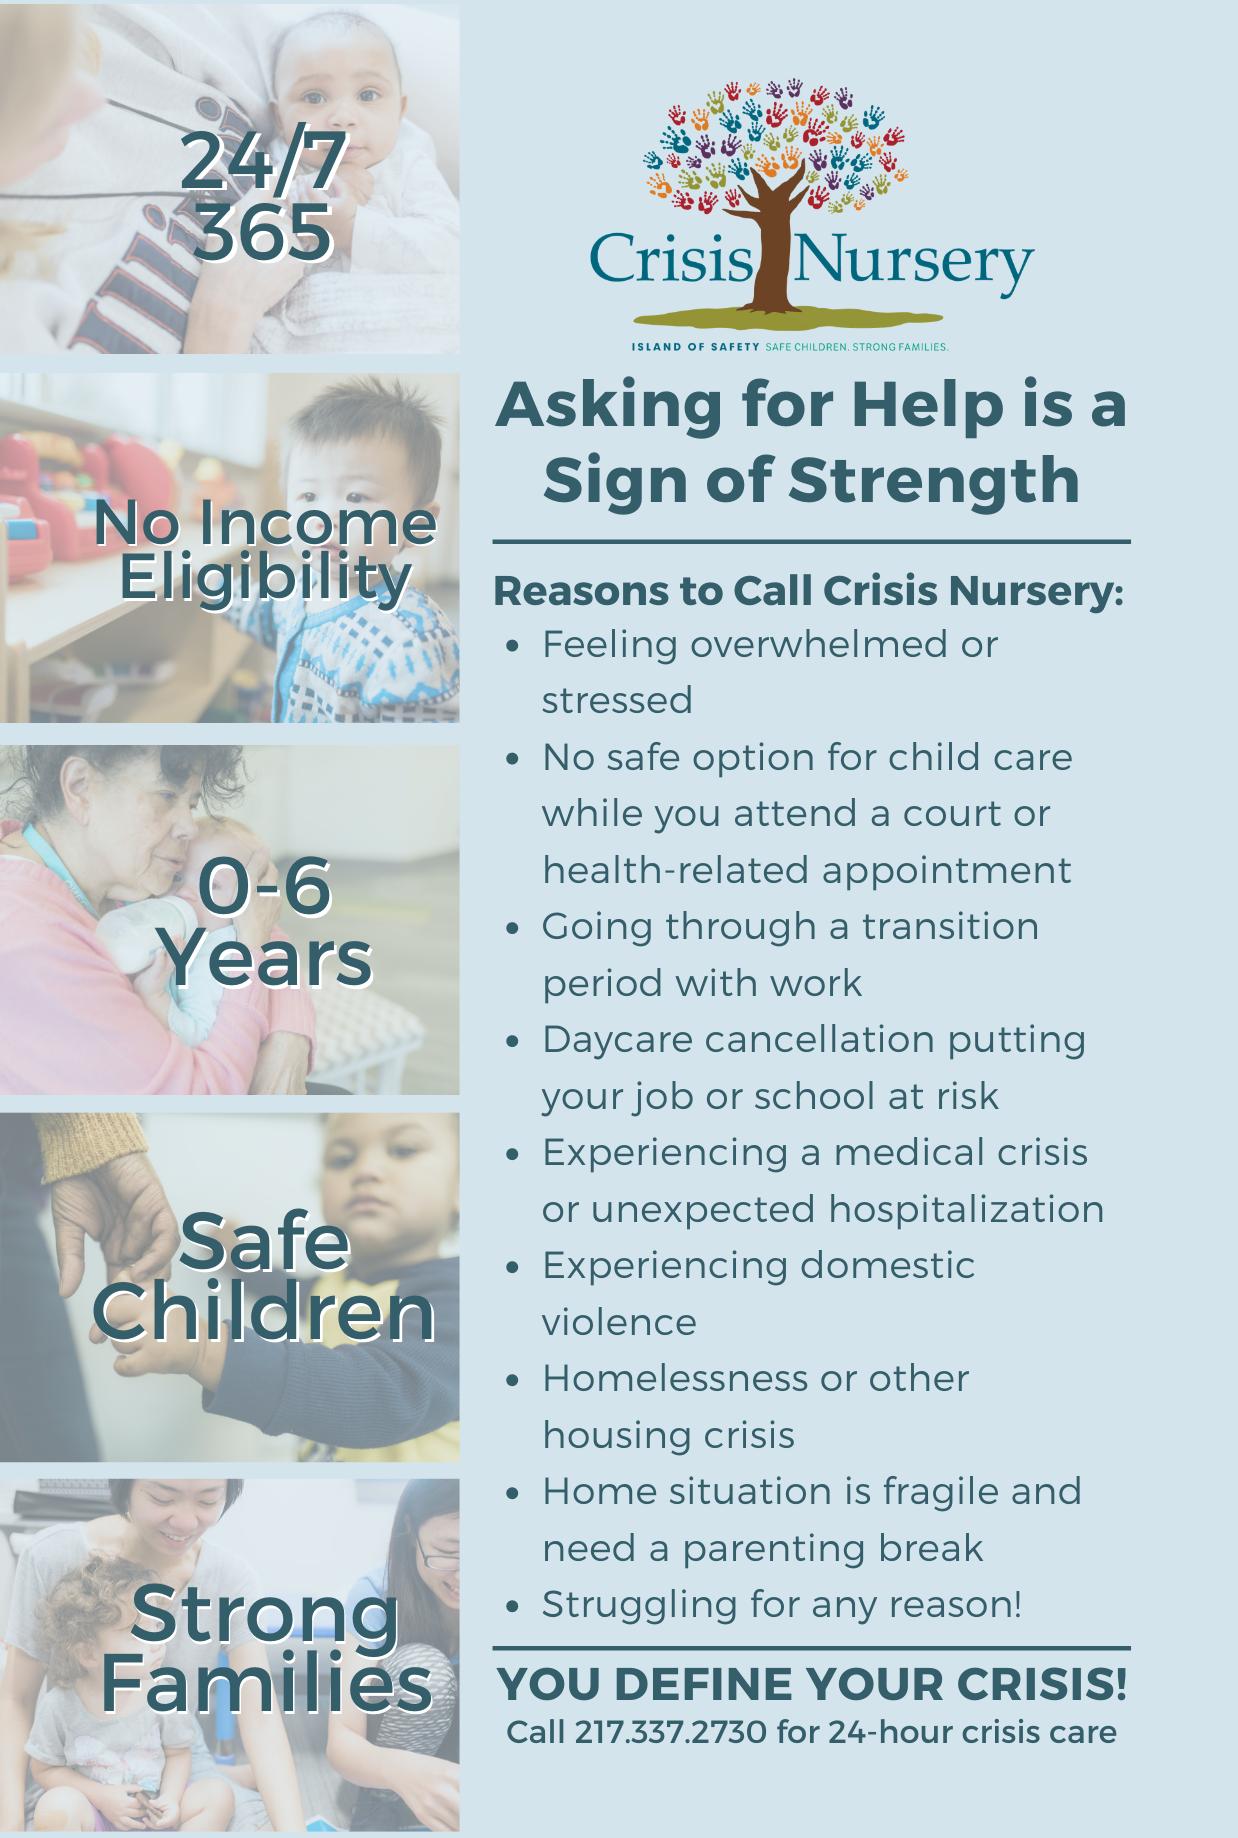 Reasons to Call CN